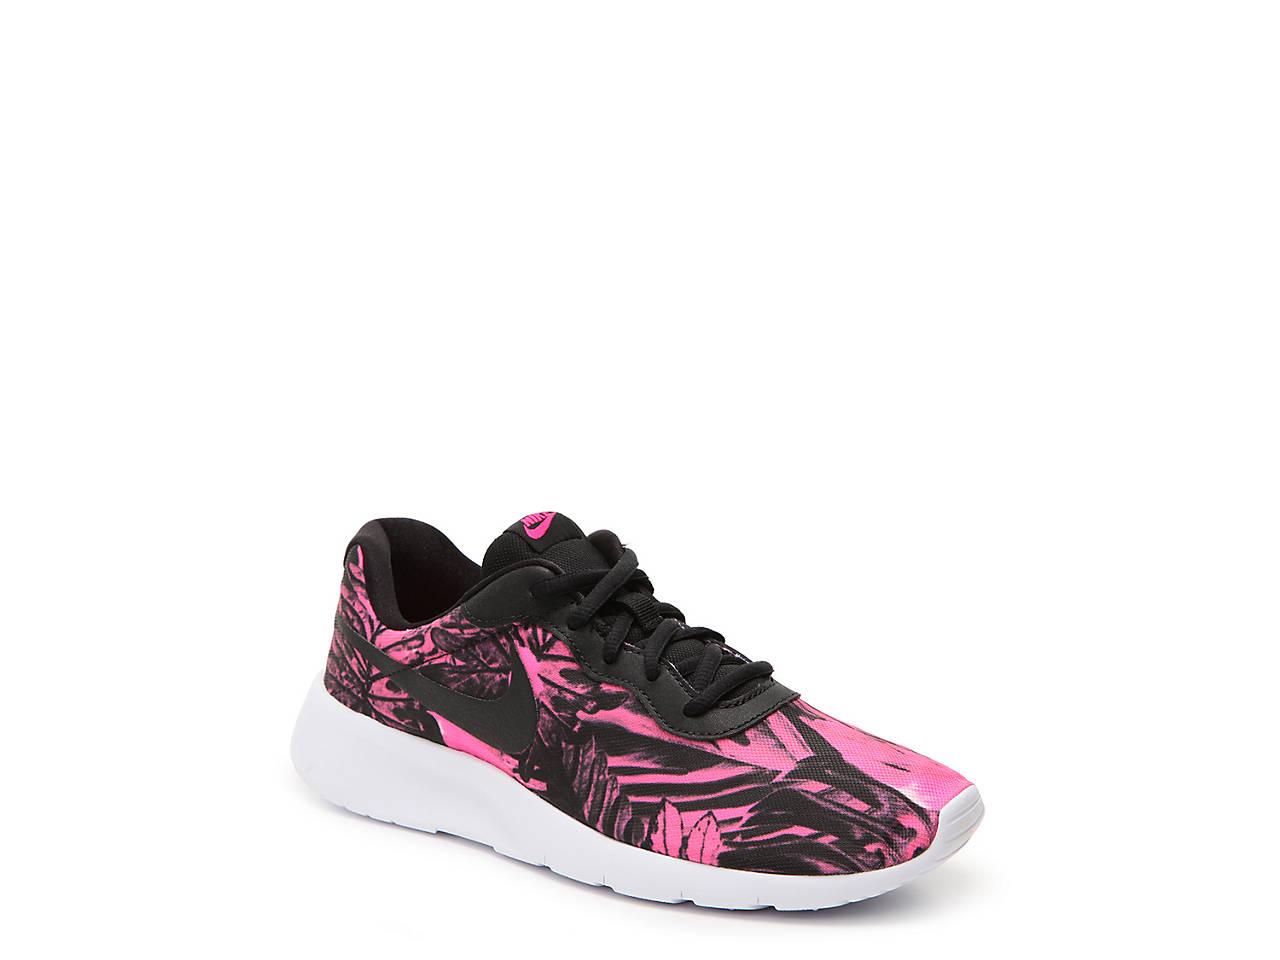 Nike Tanjun Print Youth Sneaker Kids Shoes DSW